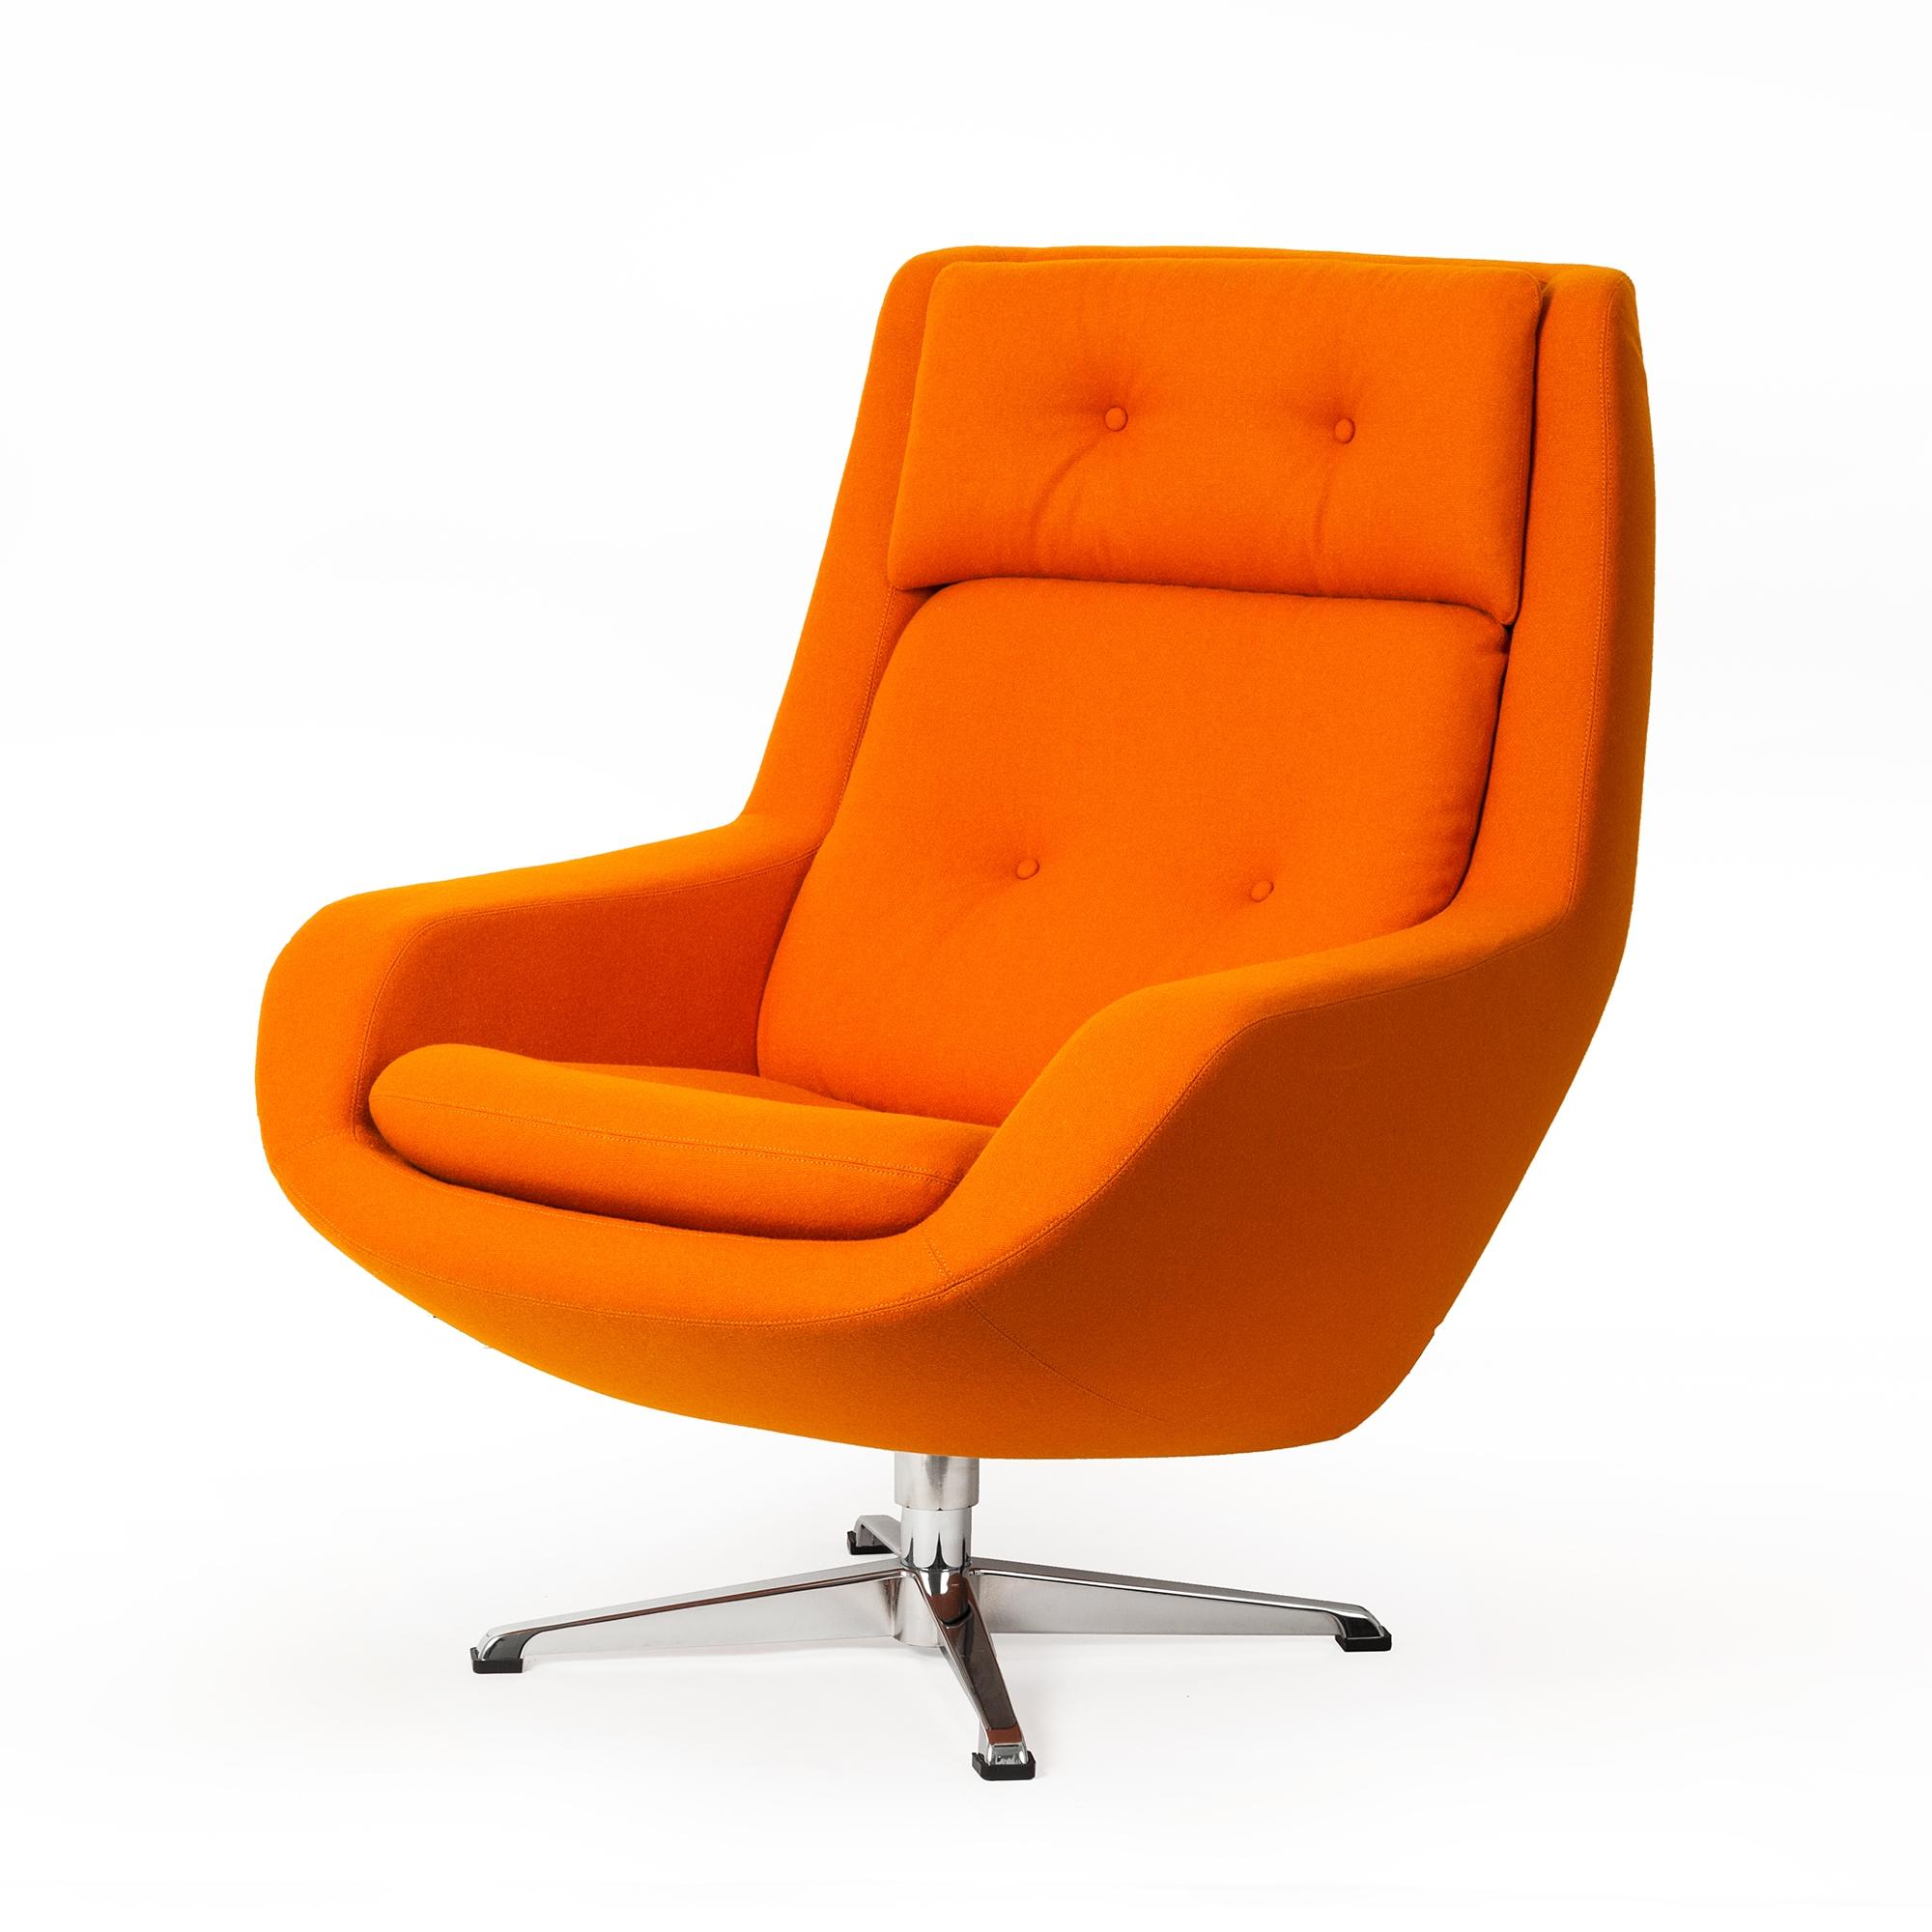 Koppla Swivel Chair  Orange. Koppla Swivel Arm Chair  Orange  The Khazana Home Austin Furniture